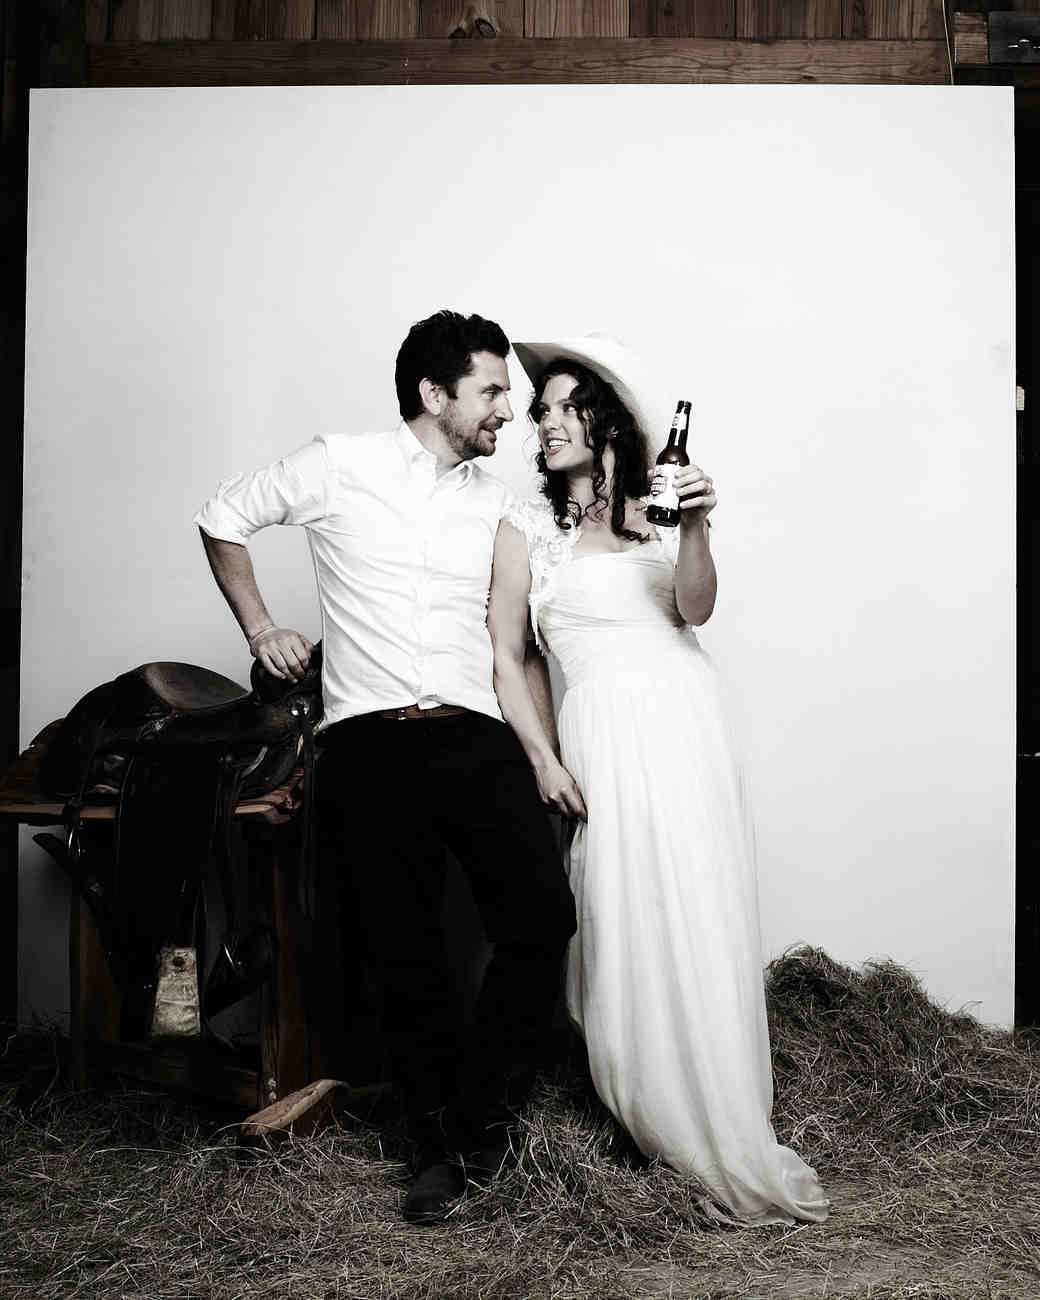 Nice 40s Wedding Theme Image - Wedding Idea 2018 - veronikajackson.info